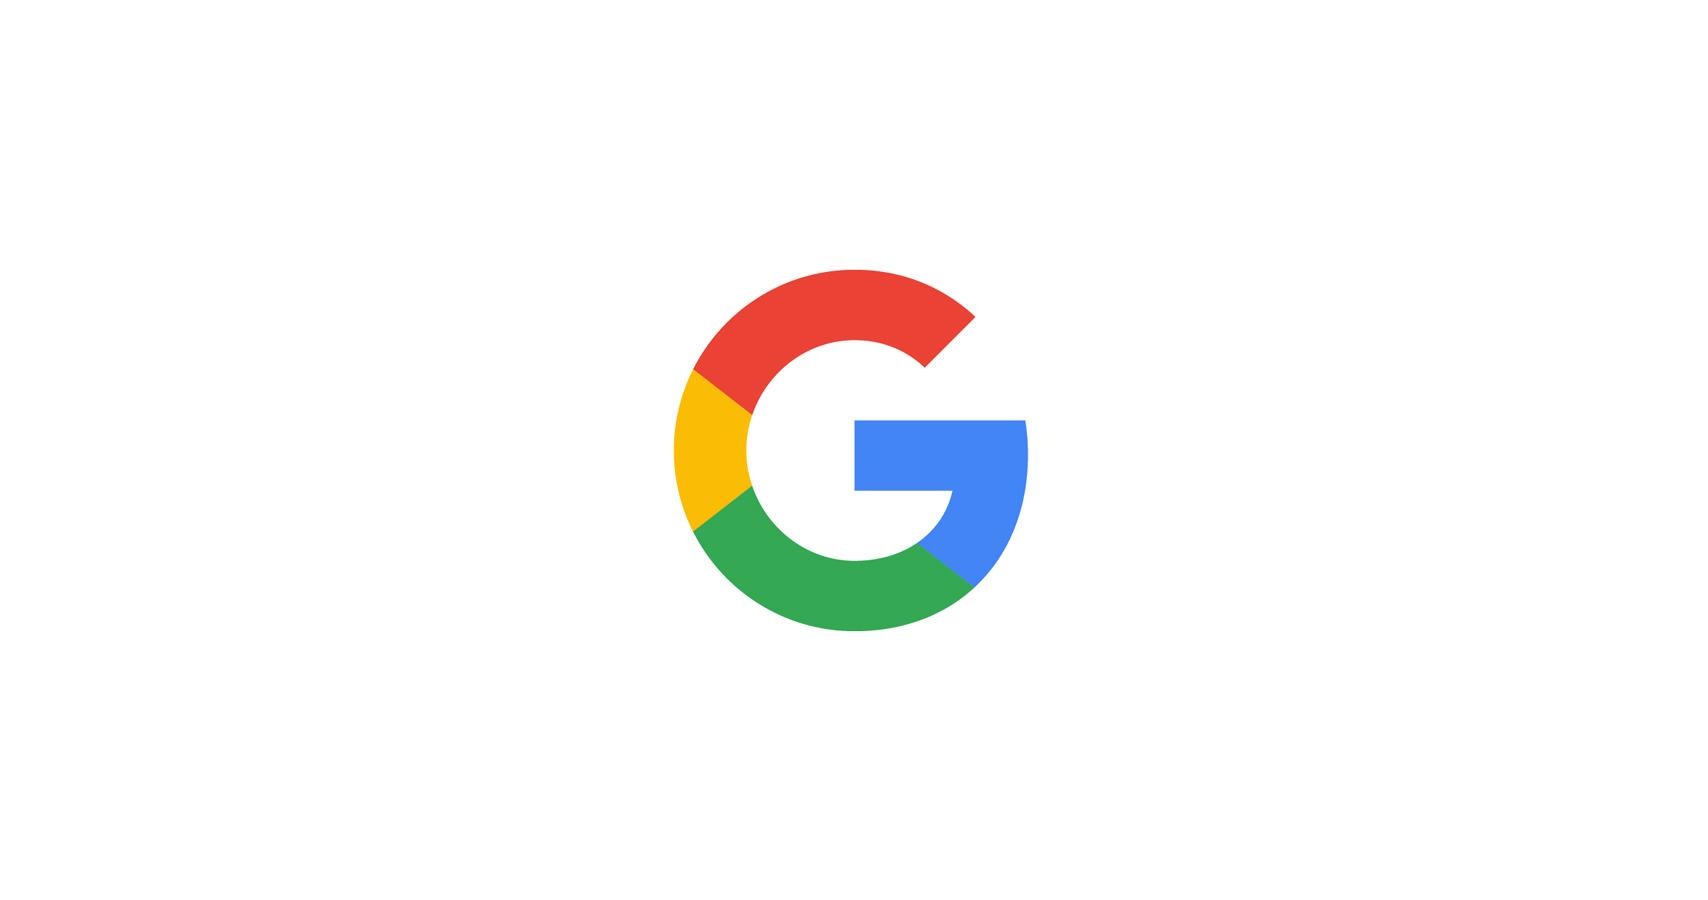 evolving_google_identity_videoposter_006.jpg